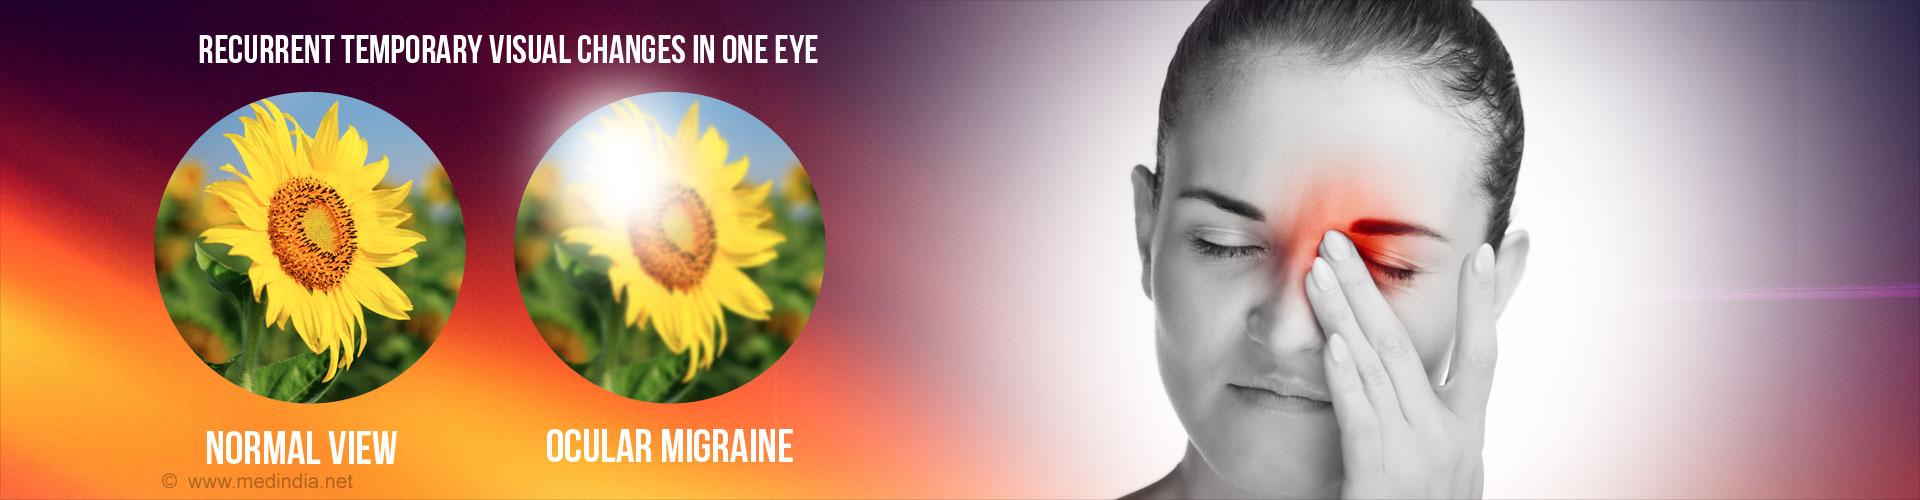 Retinal Migraine (Ocular Migraine)